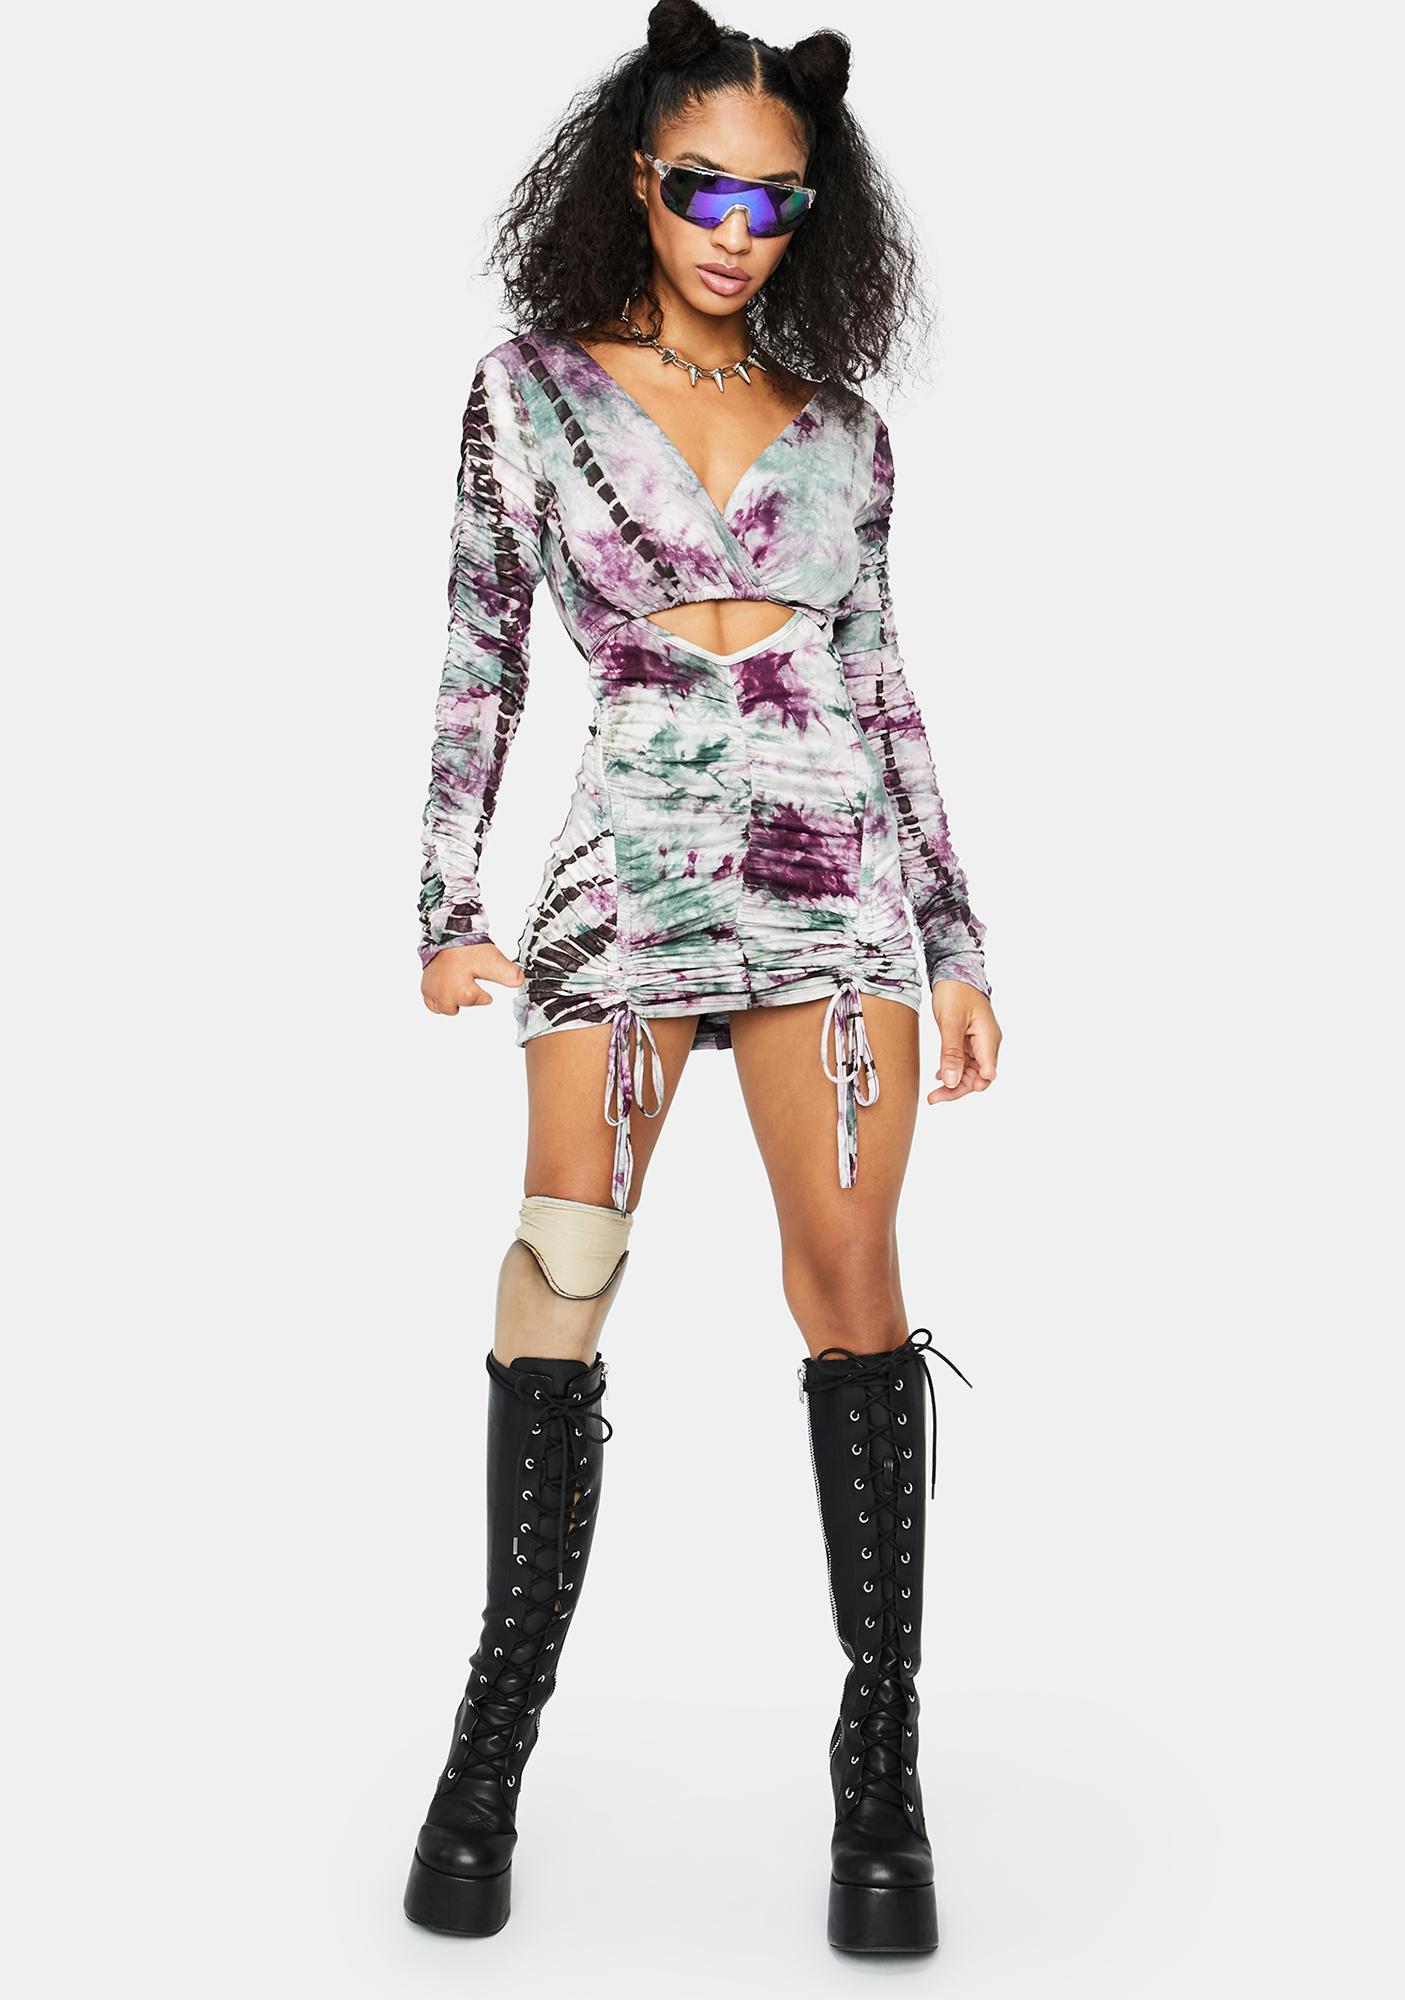 All Nighter Hottie Mini Dress